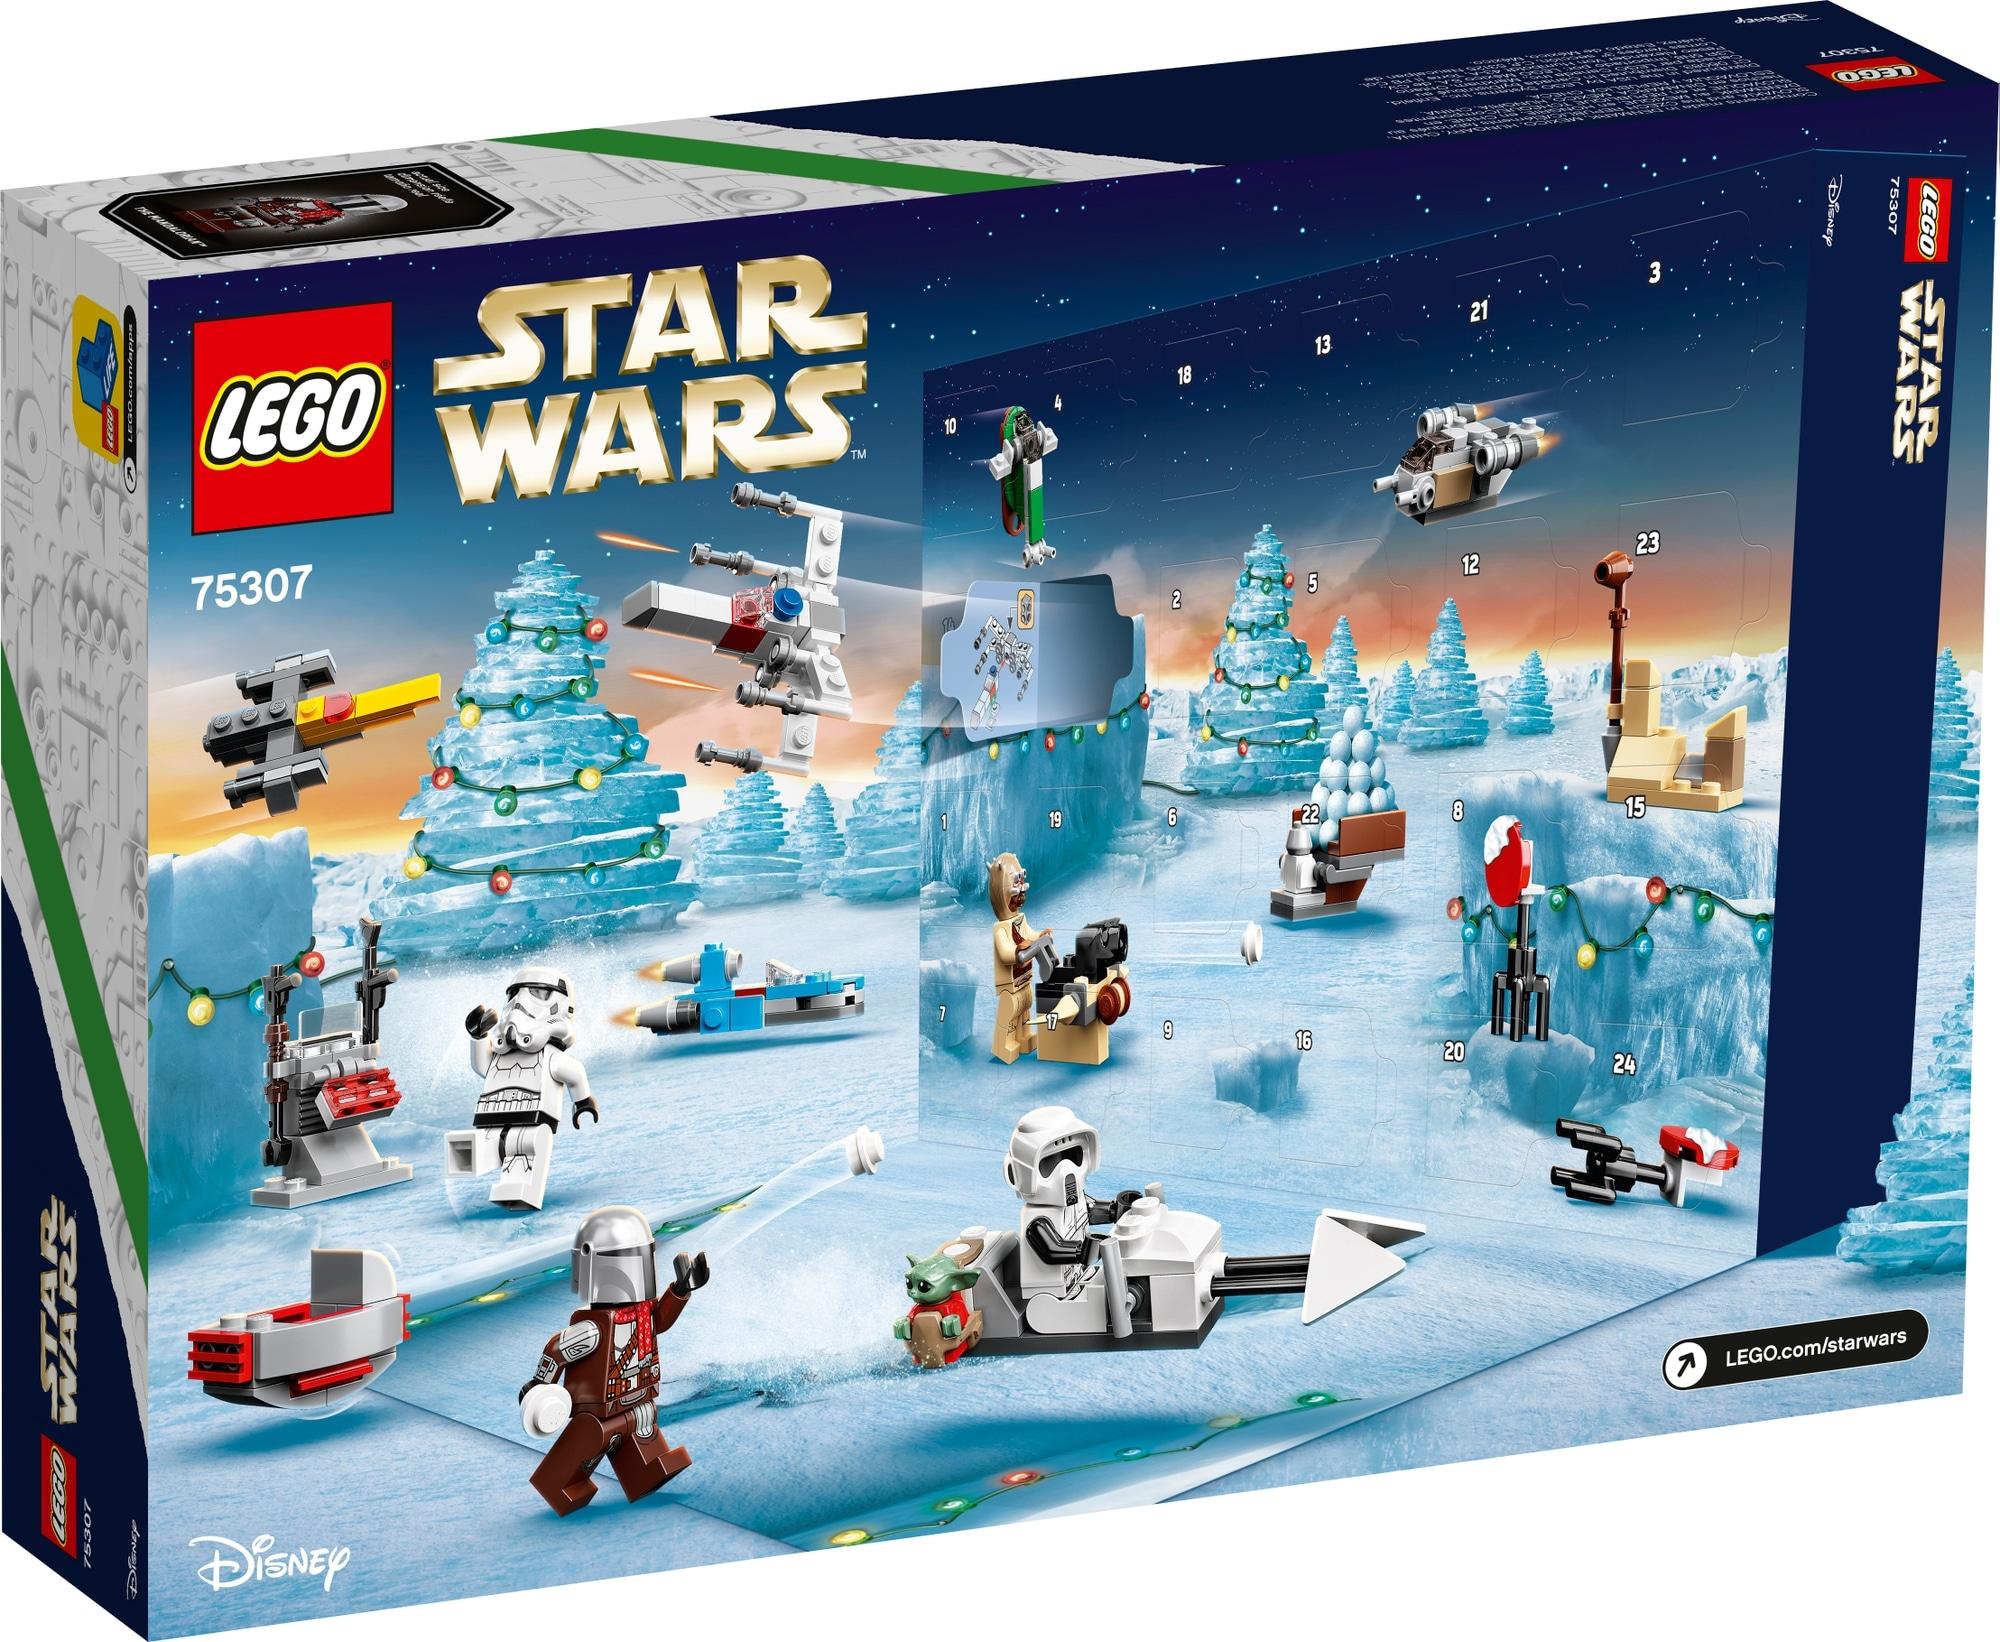 LEGO 75307 LEGO Star Wars Adventskalender 2021 6